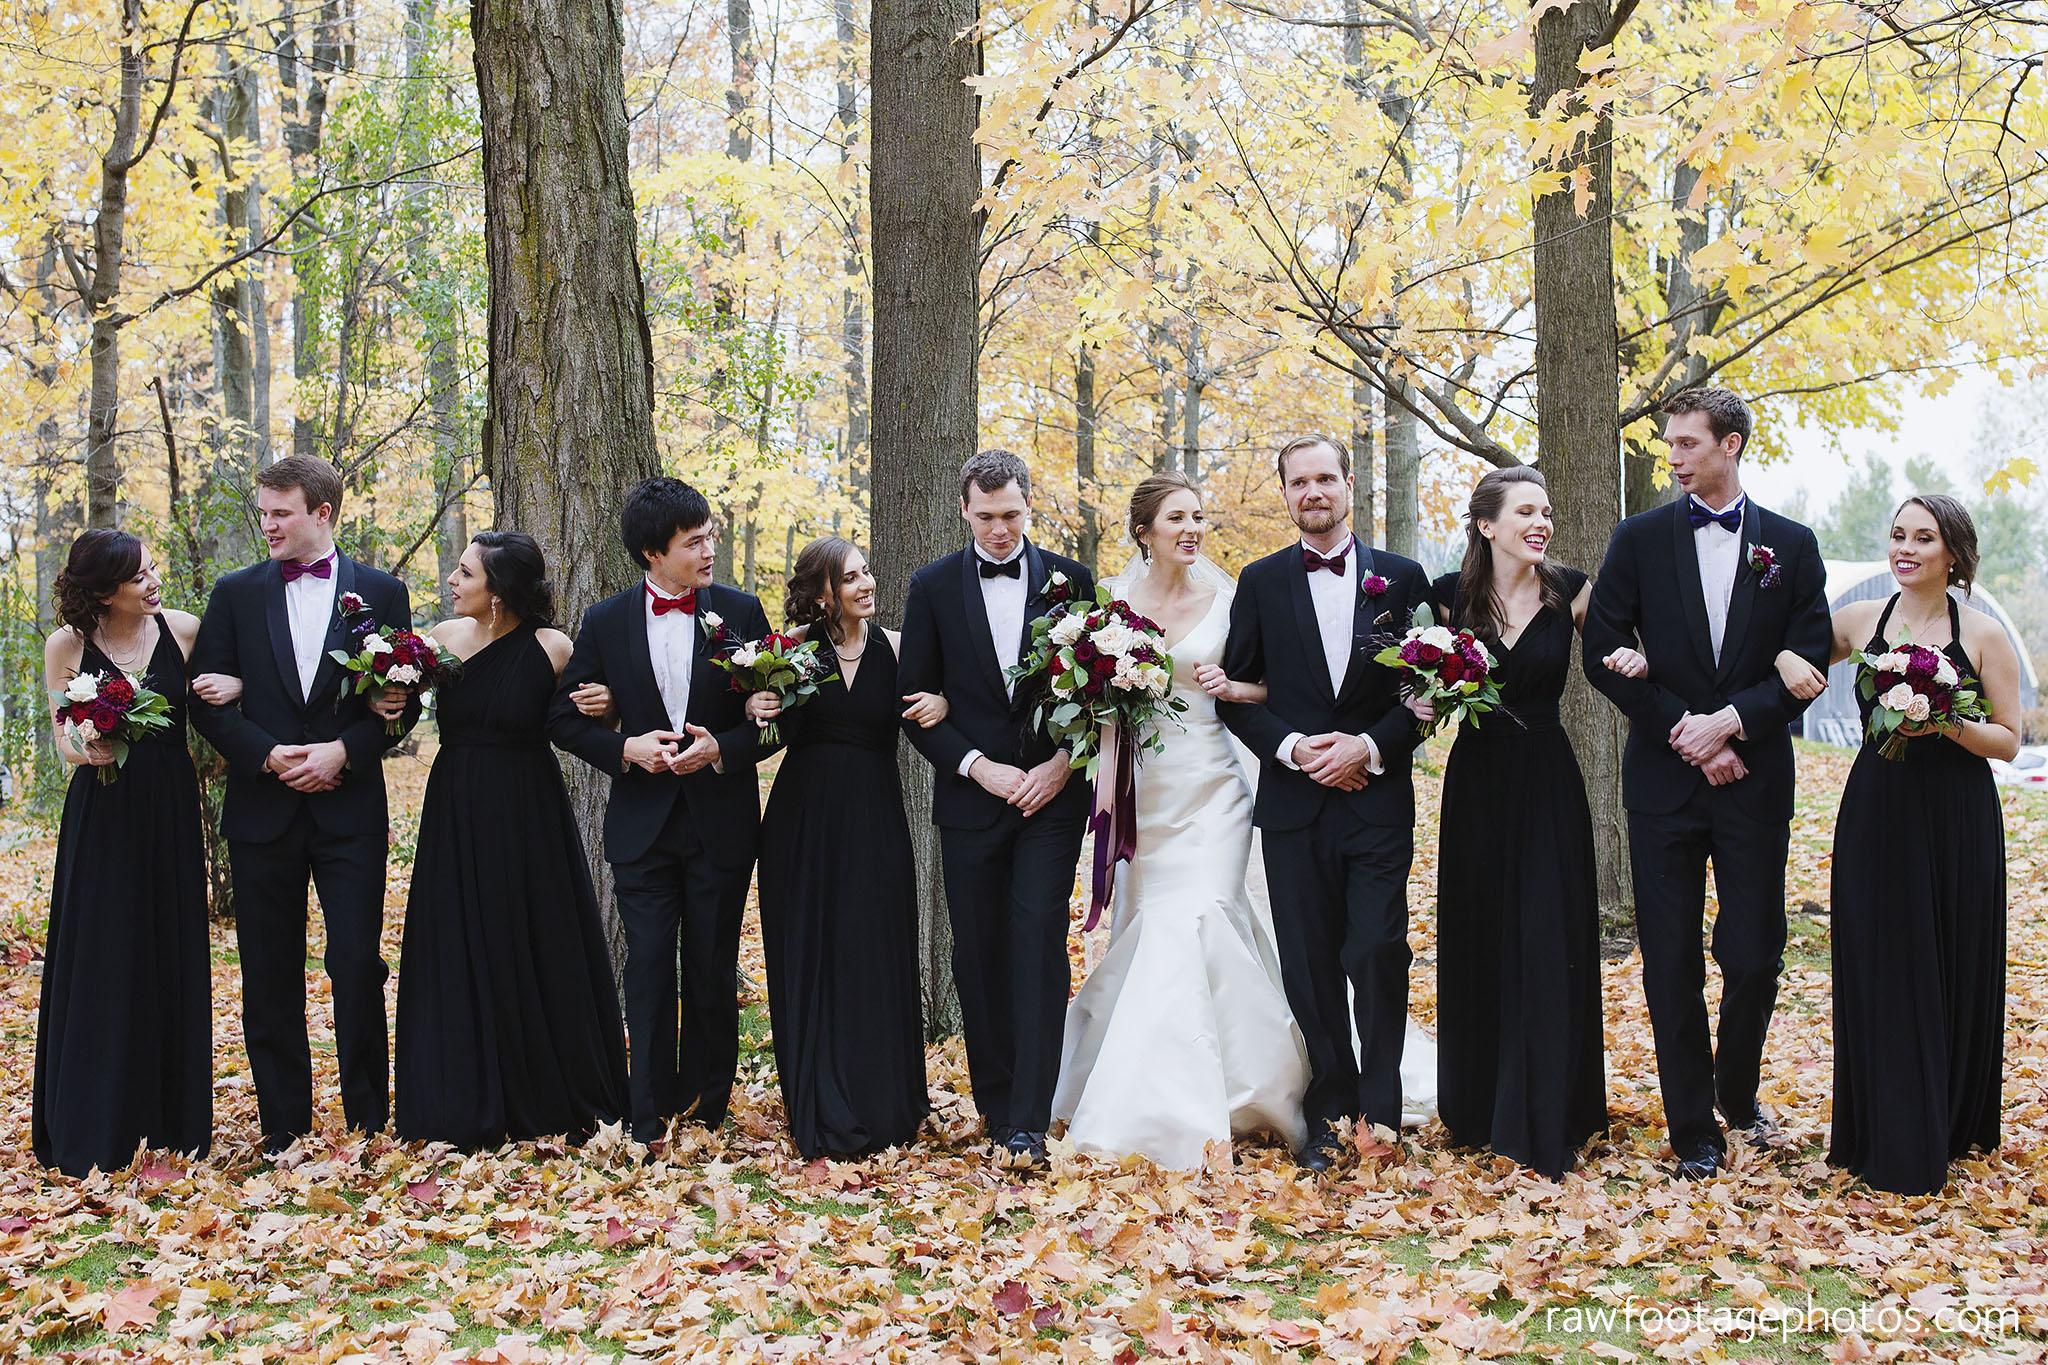 london_ontario_wedding_photos-fall_wedding_photography-raw_footage_photography-elm_hurst_inn_wedding023.jpg